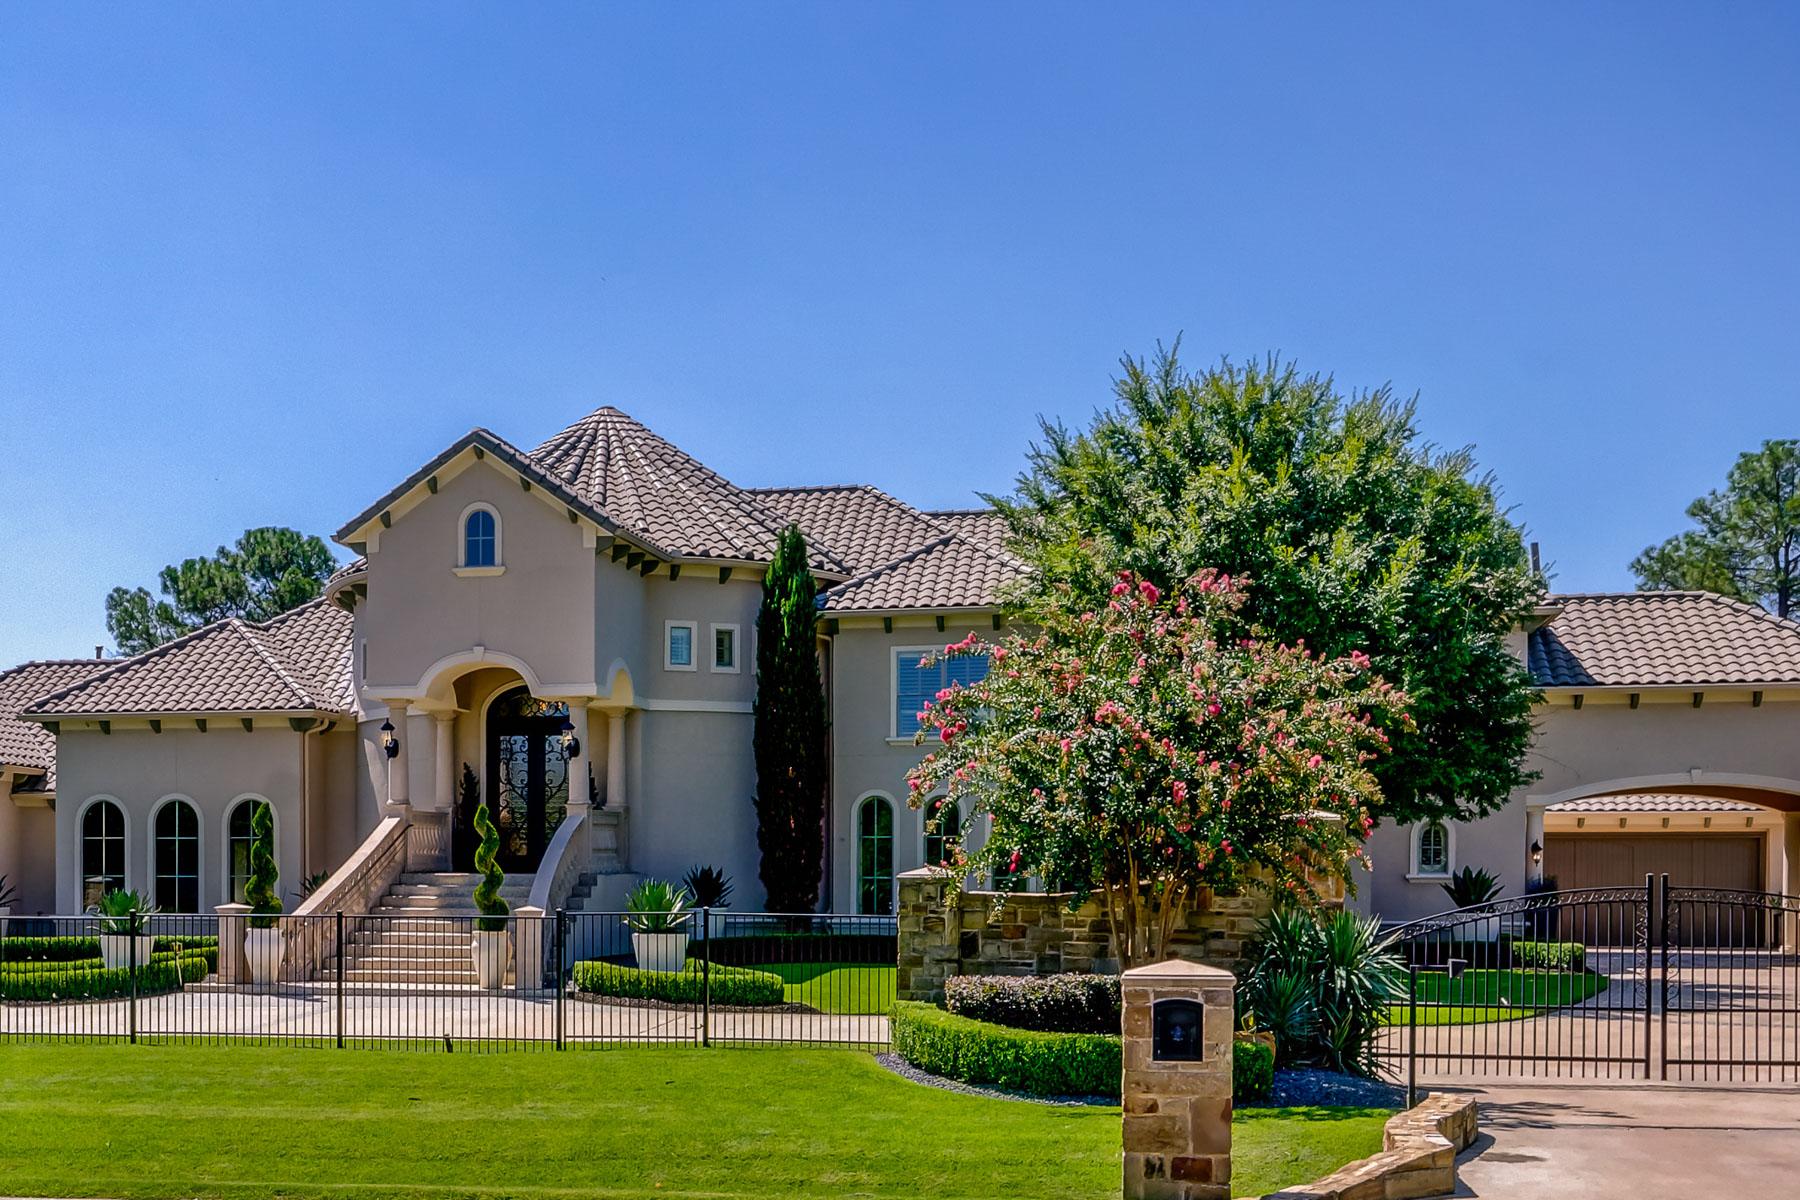 独户住宅 为 销售 在 Westlake Transitional Soft Contemporary Offers Res 1567 Dove Rd Roanoke, 得克萨斯州, 76262 美国